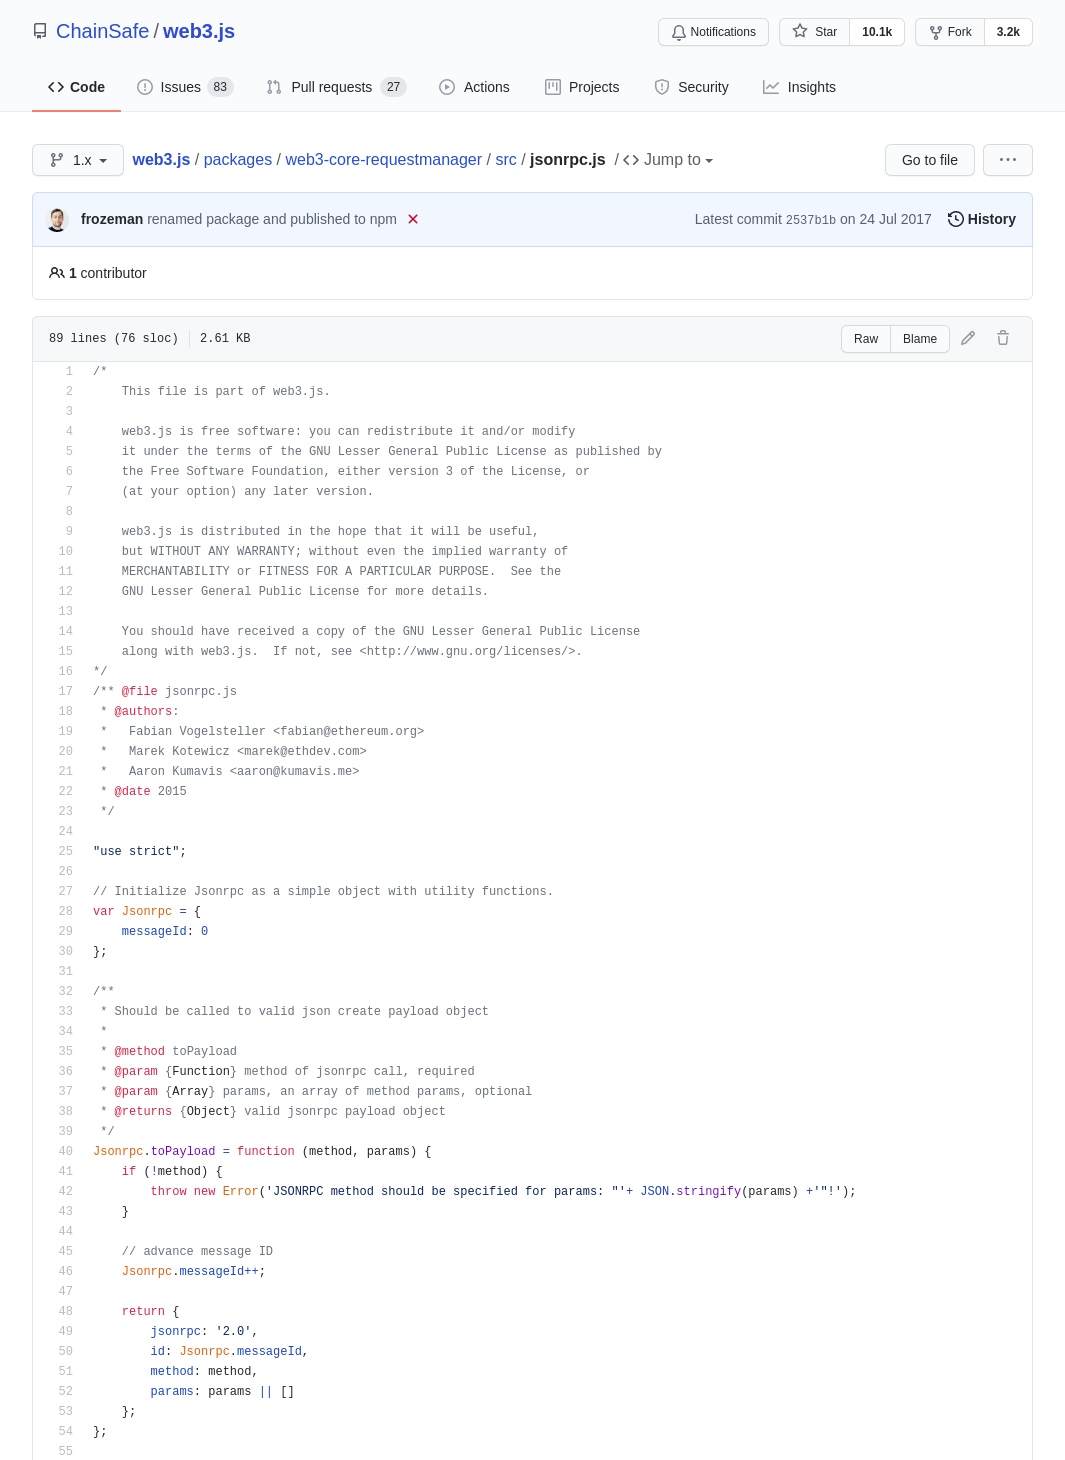 odoo区块链以太坊智能合约web3.js库jsonrpc协议